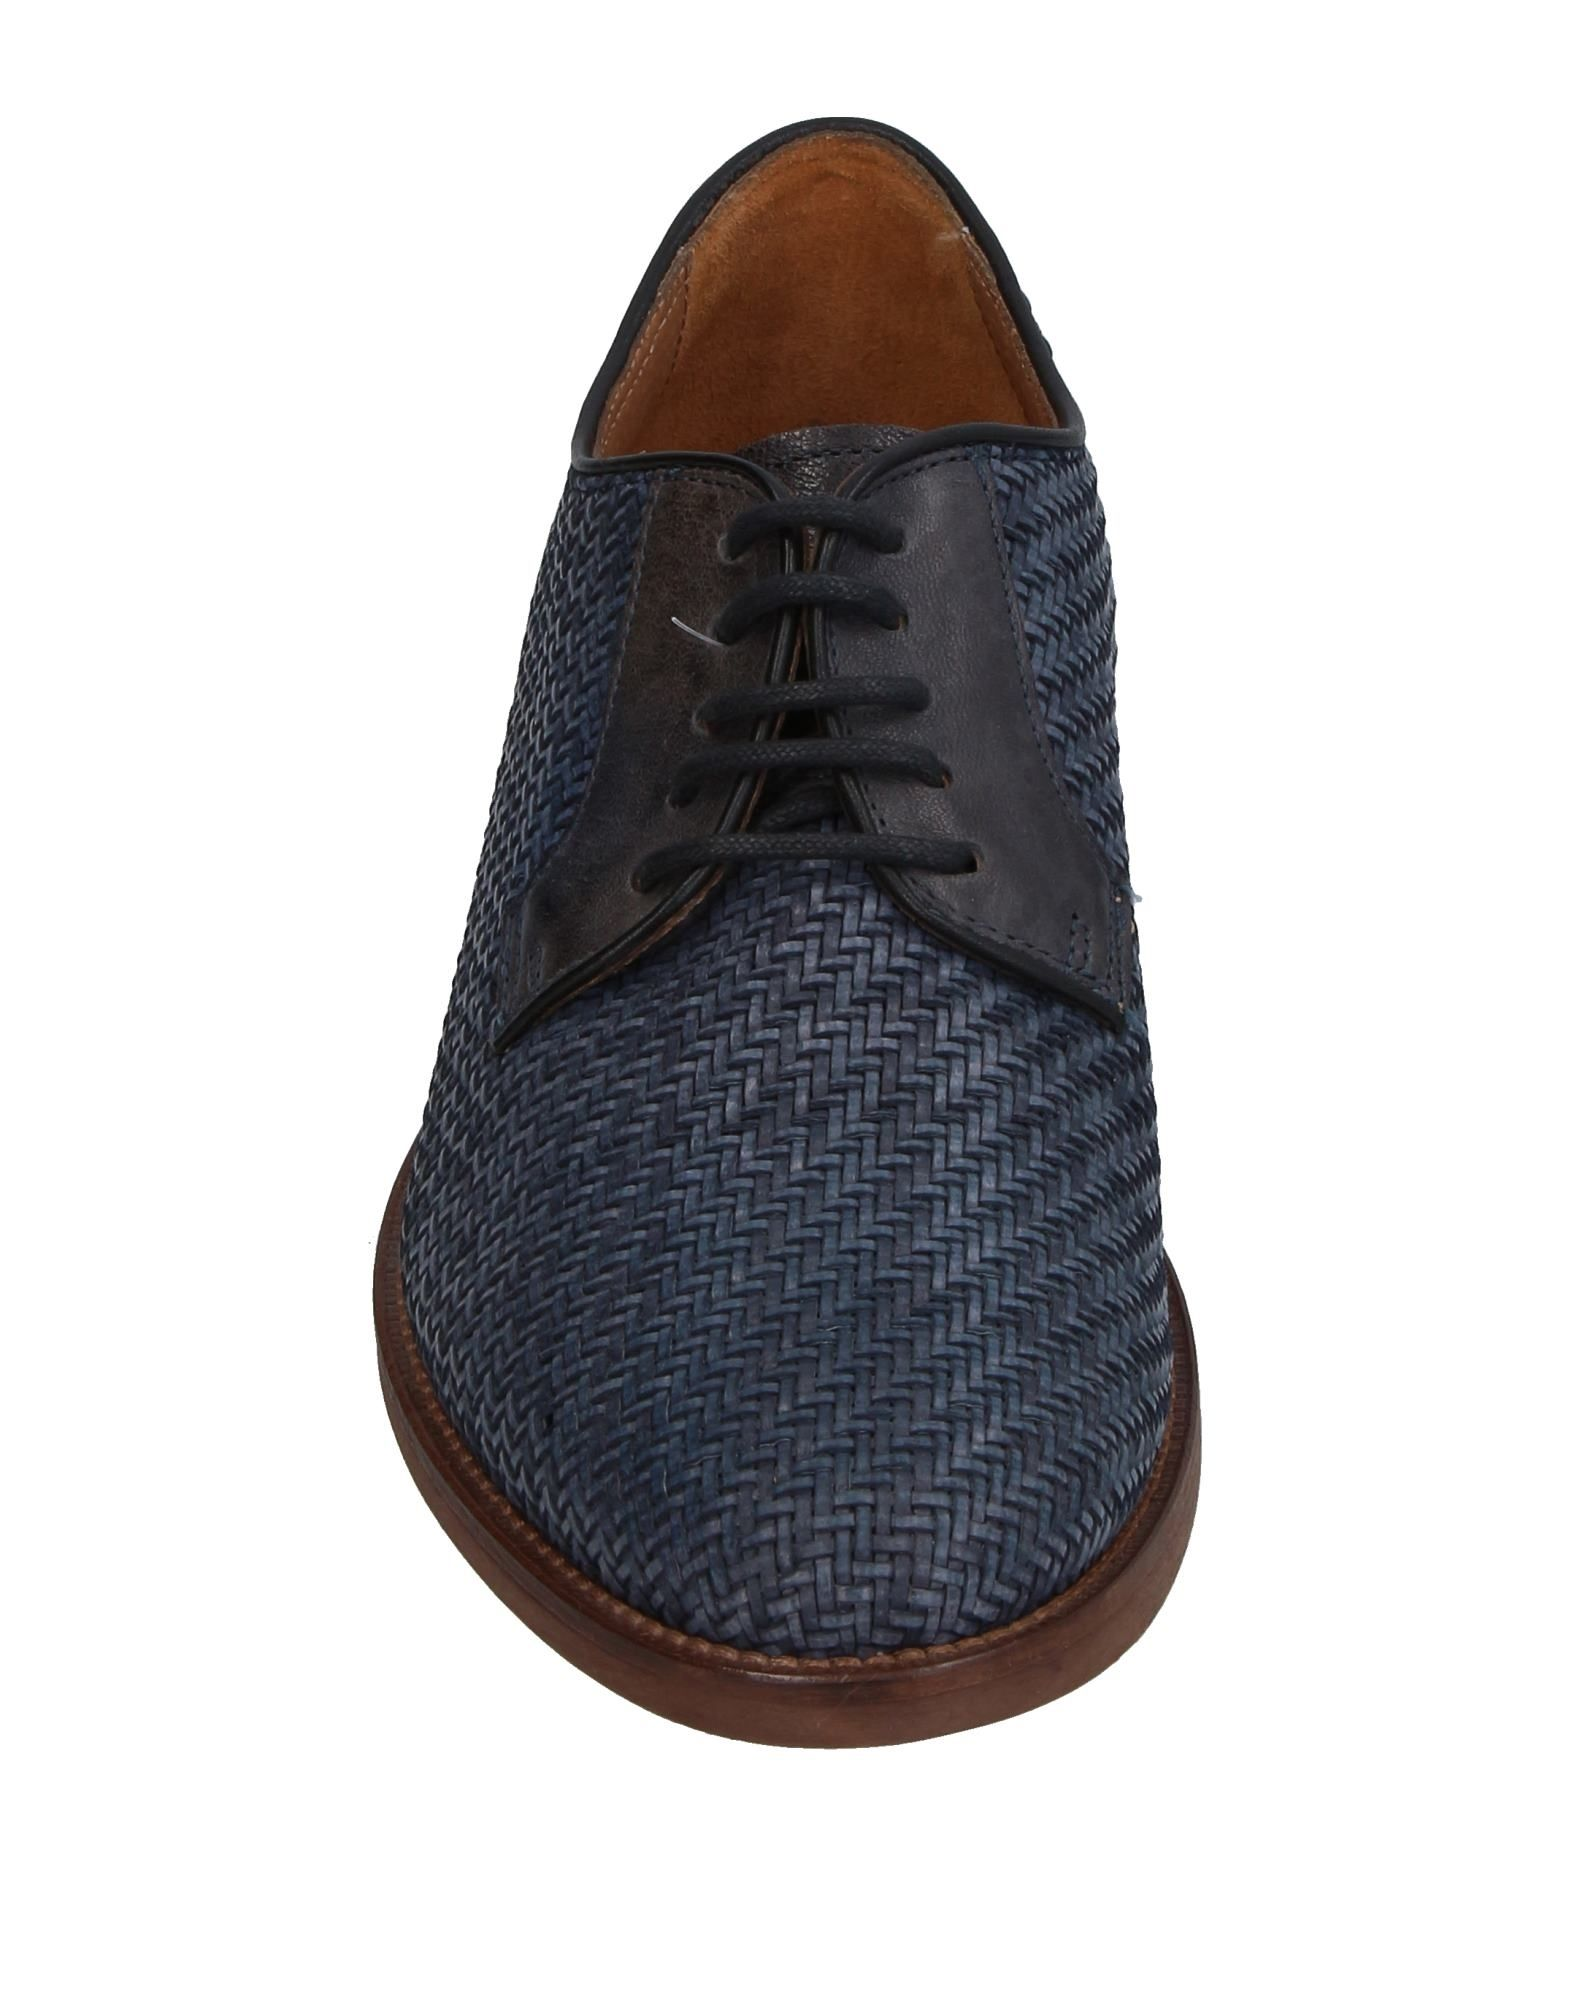 CHAUSSURES - Chaussures à lacetsSoldini 7f1g0I5X